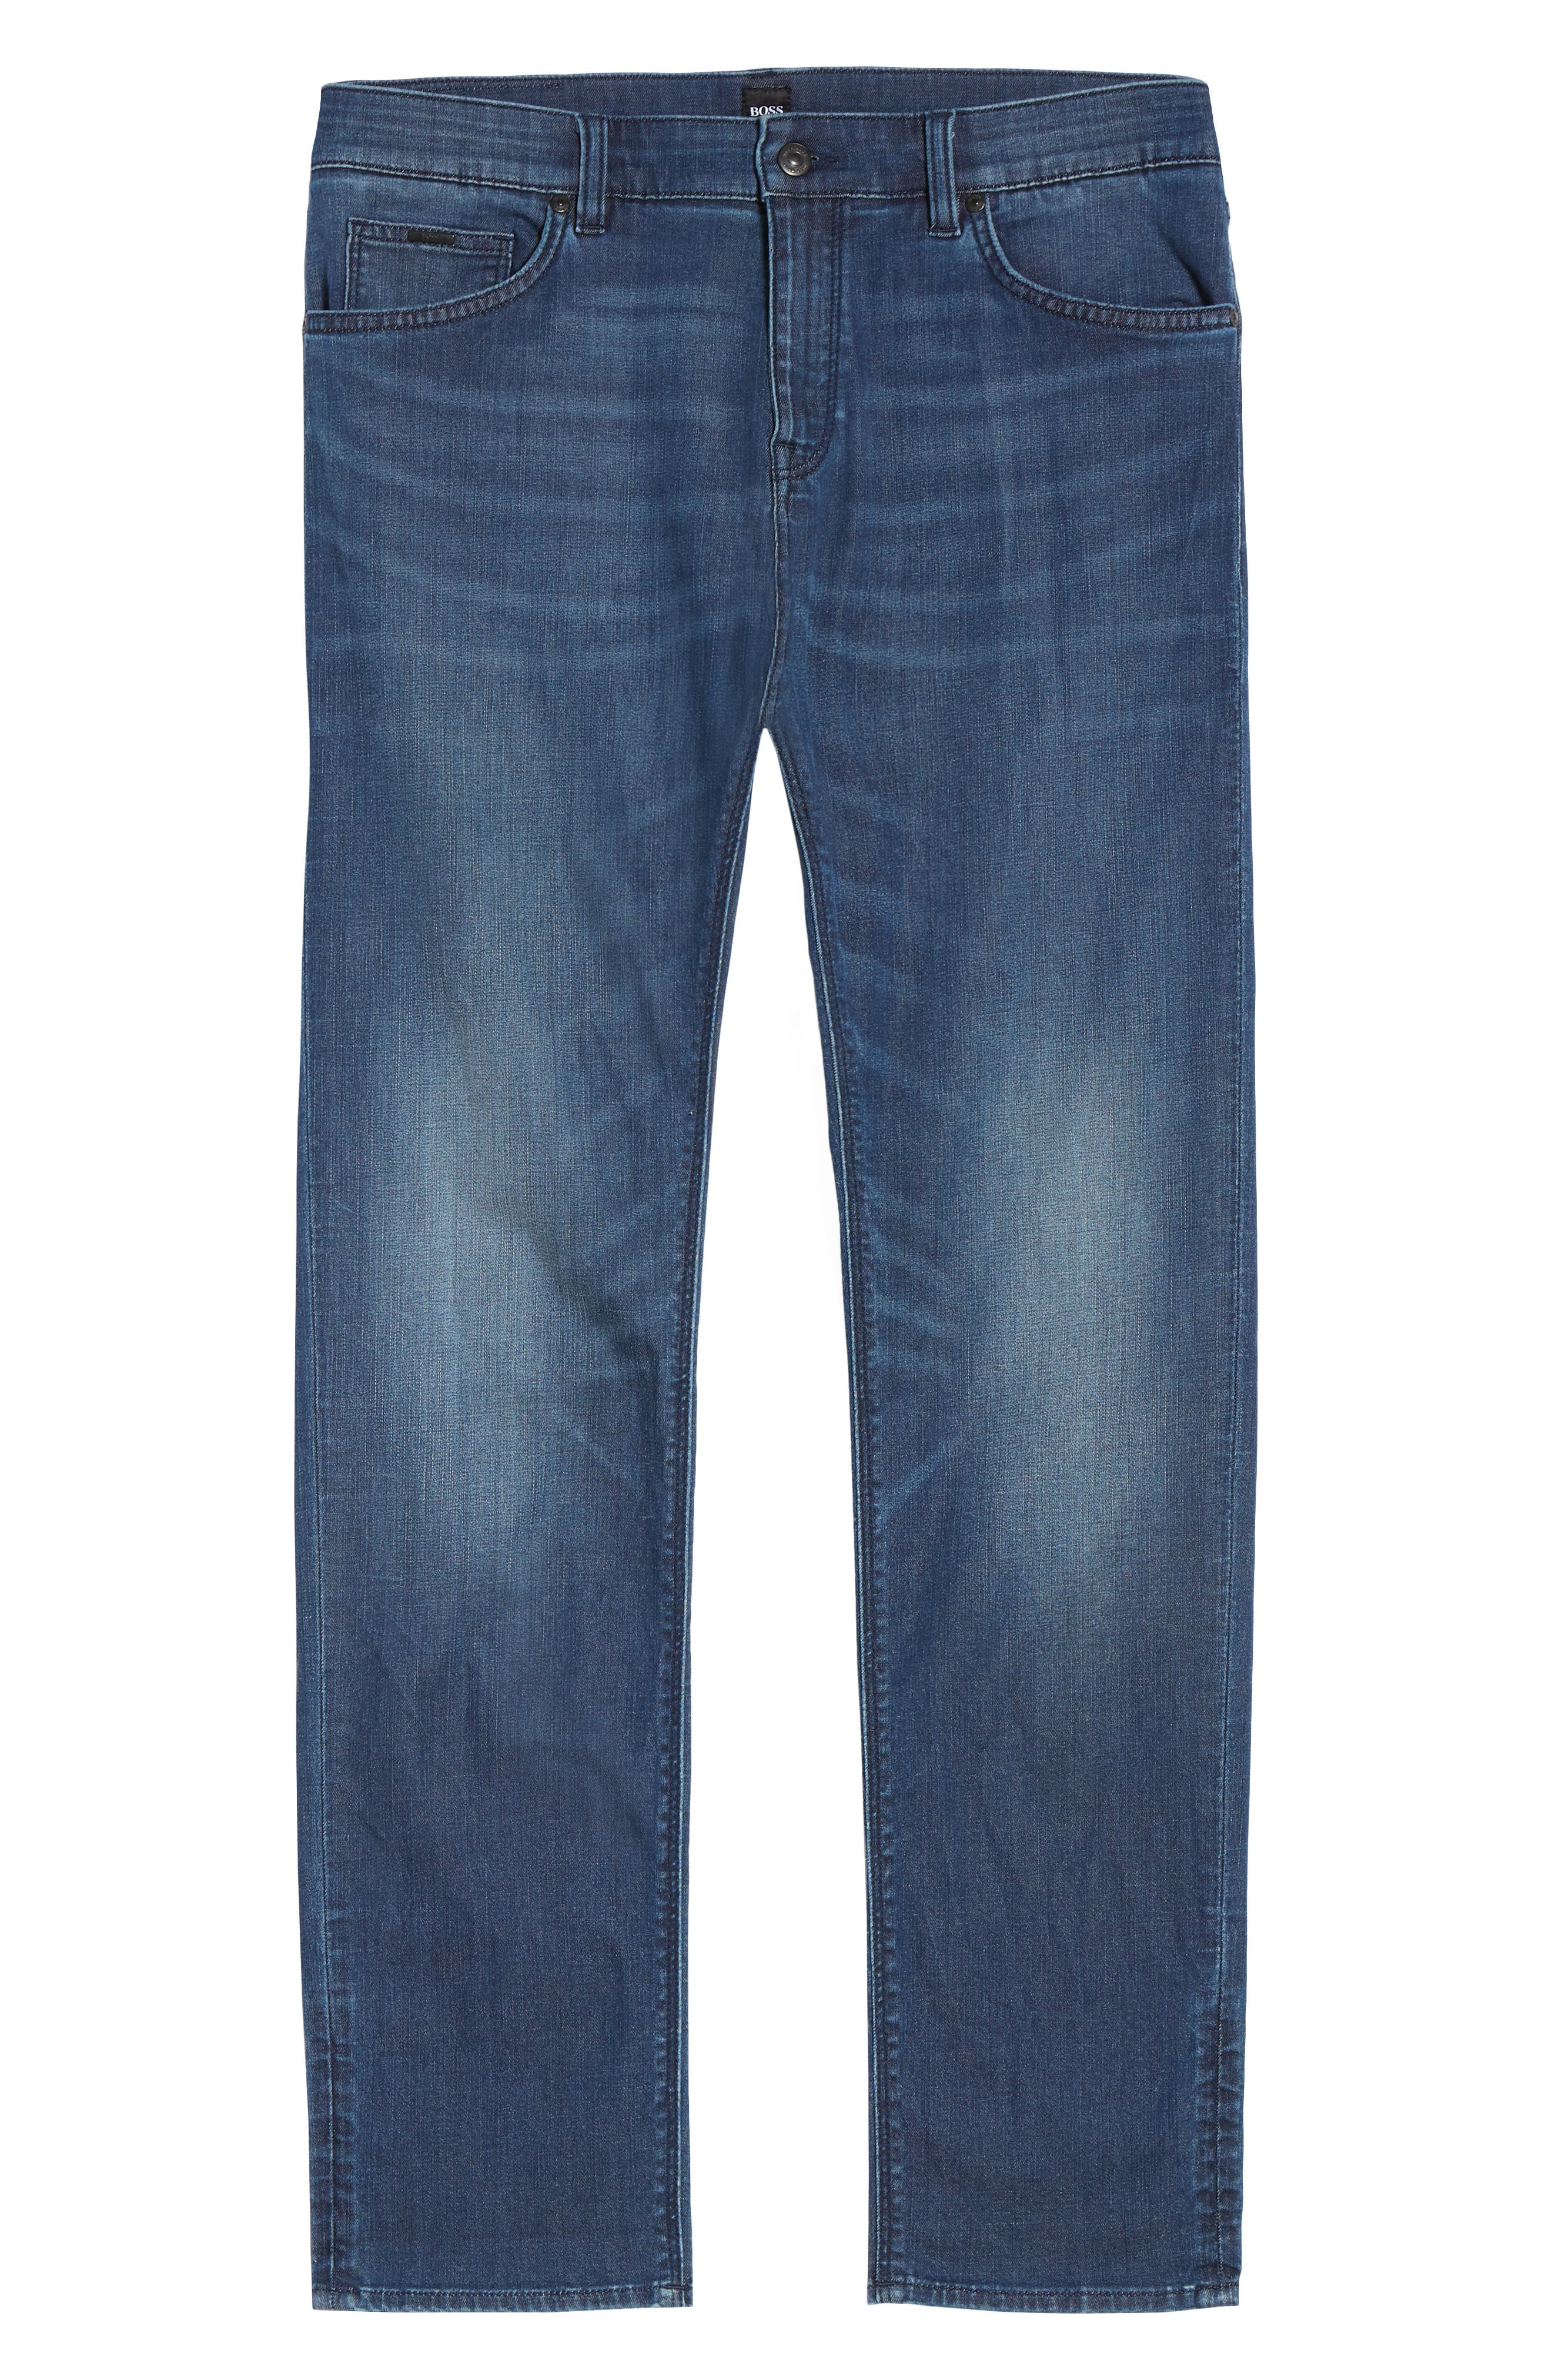 Maine Straight Leg Jeans,                             Alternate thumbnail 6, color,                             Blue